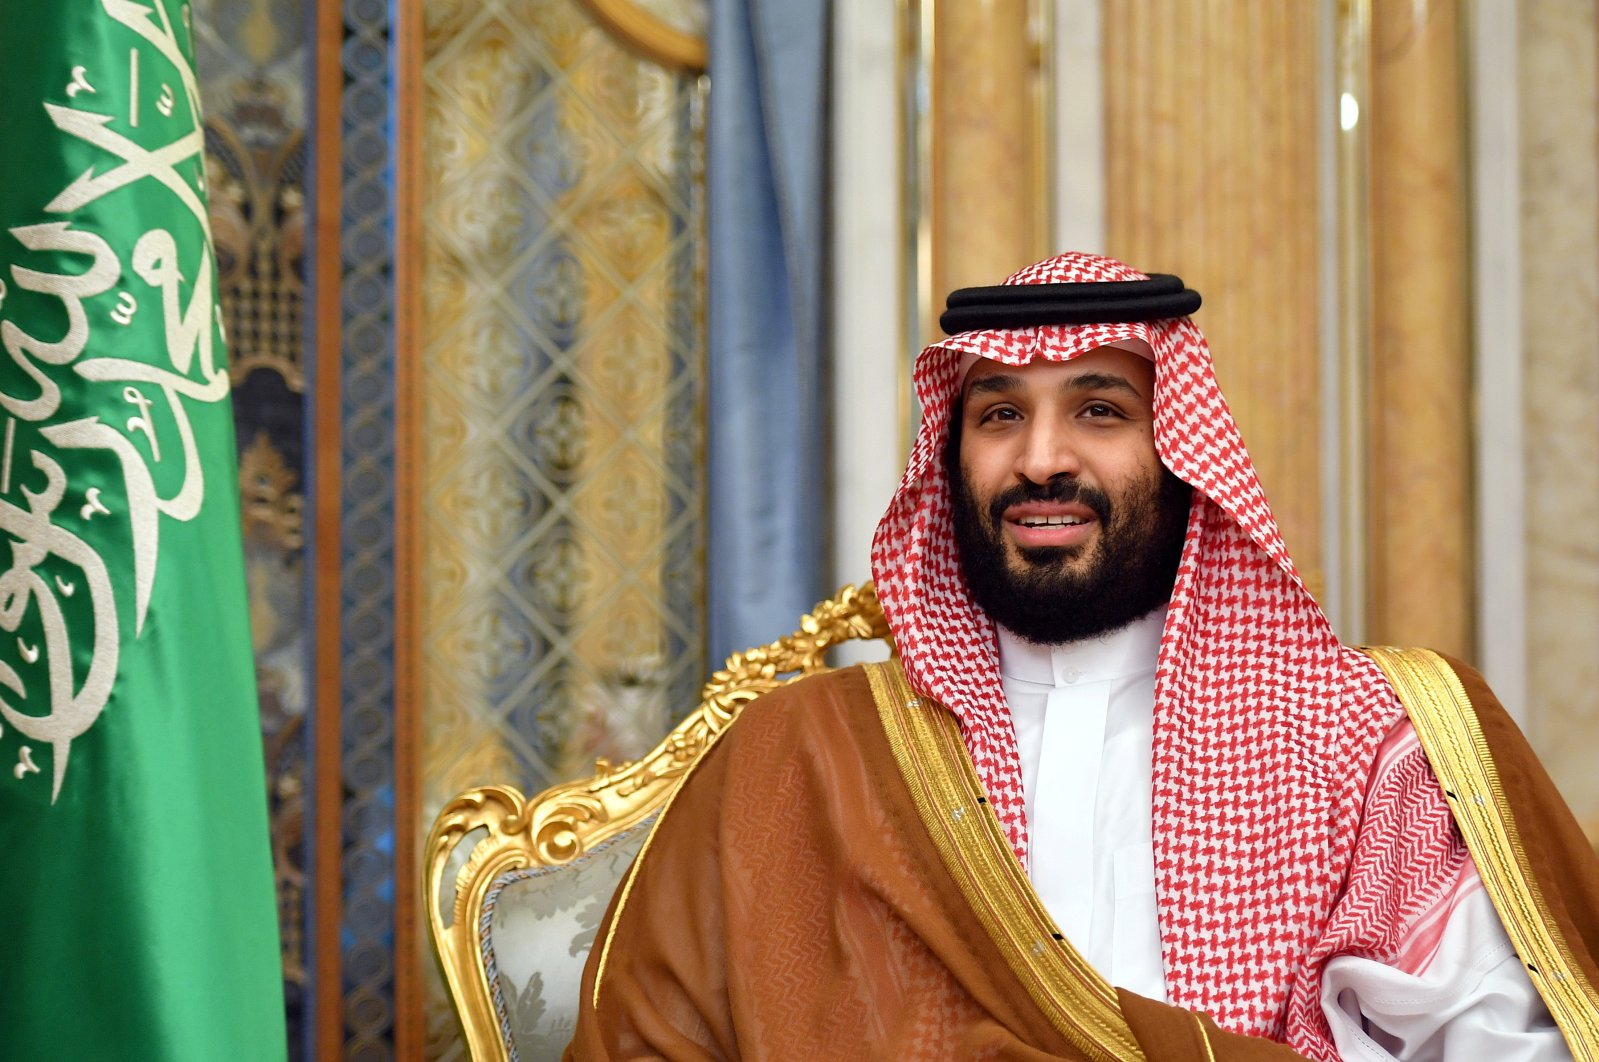 Saudi Arabia's Crown Prince Mohammed bin Salman attends a meeting with U.S. Secretary of State Mike Pompeo, Jeddah, Saudi Arabia, Sept. 18, 2019. (Reuters Photo)